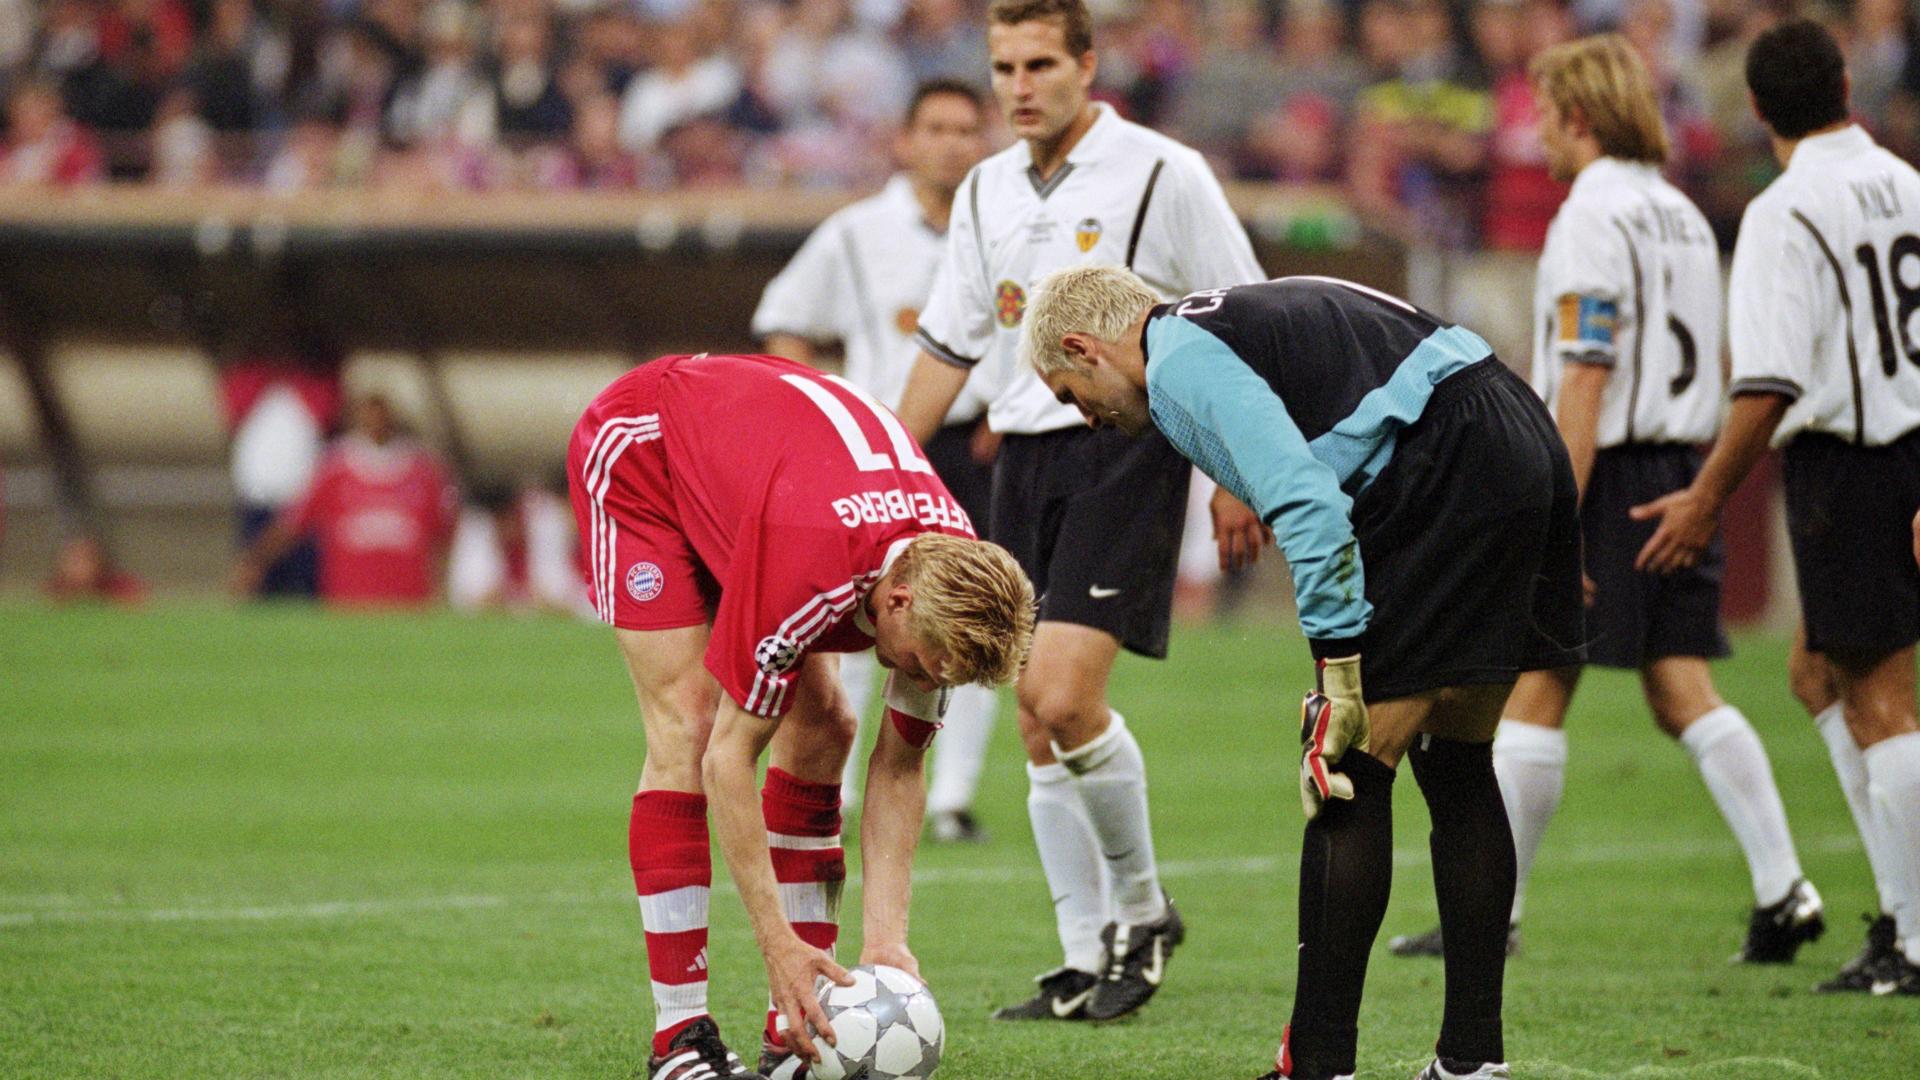 Canizares Valencia Bayern Munich Champions League 23052001